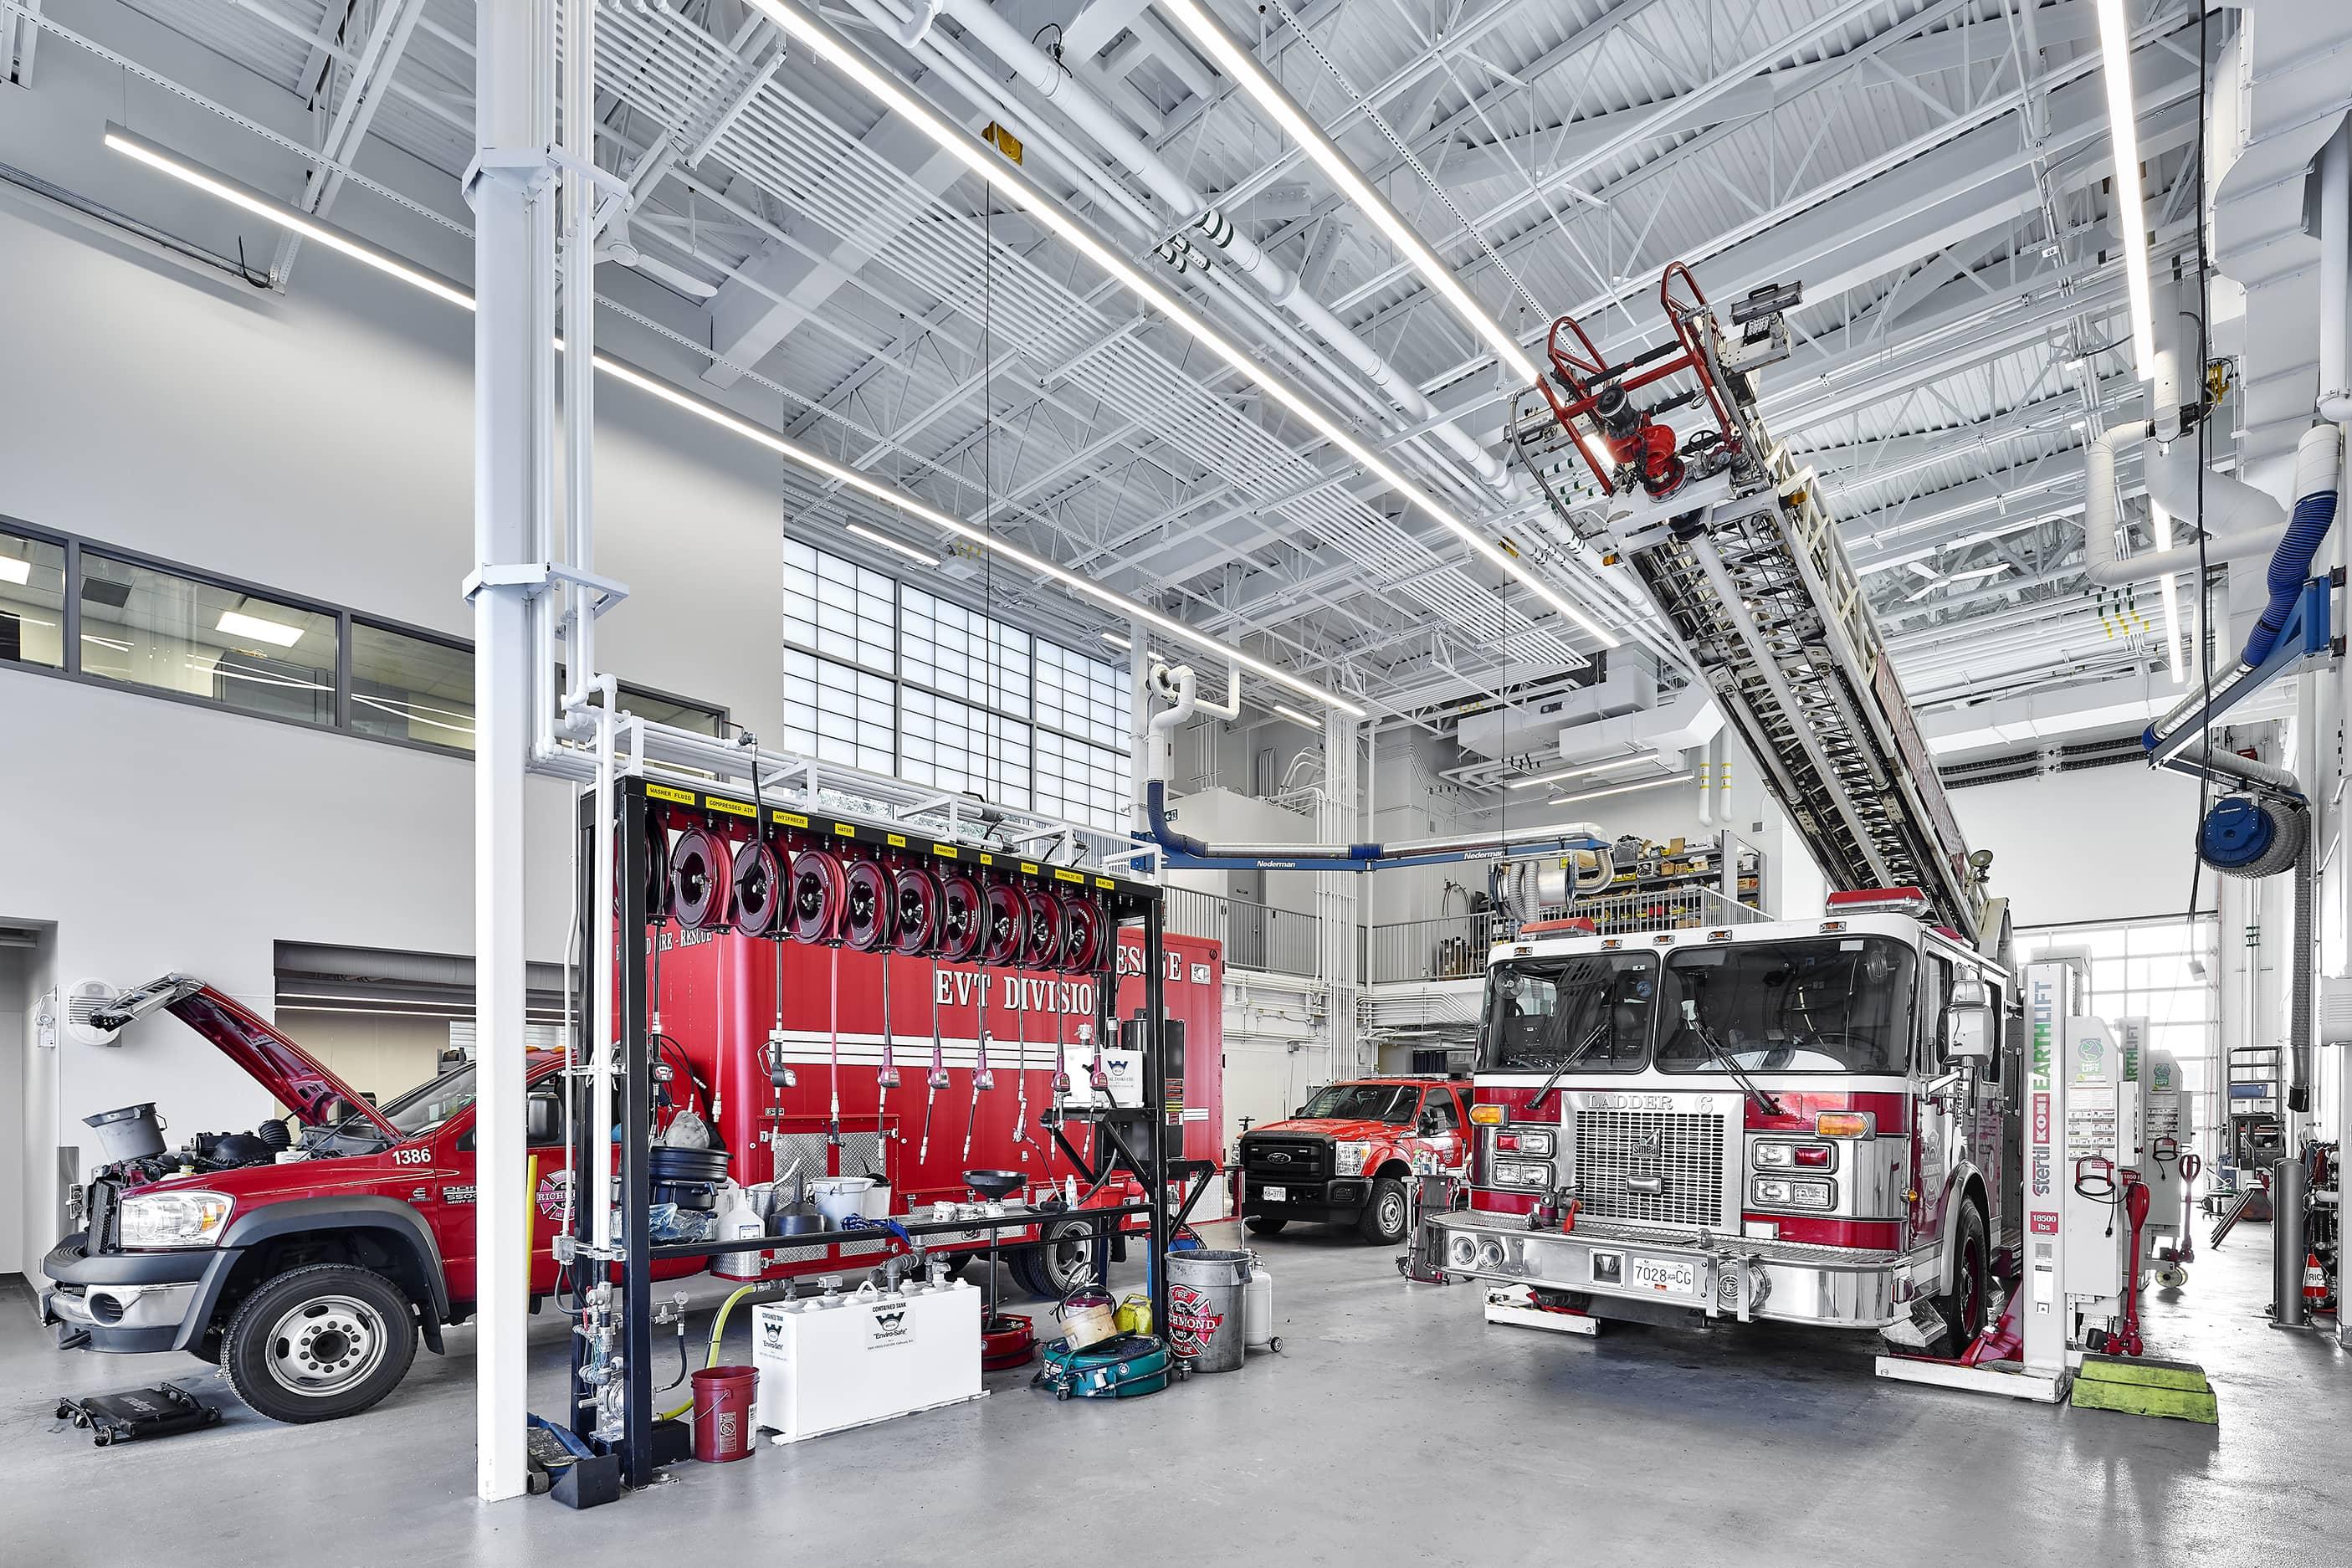 bbp cambie fire hall no. 3 & ambulance station garage 1